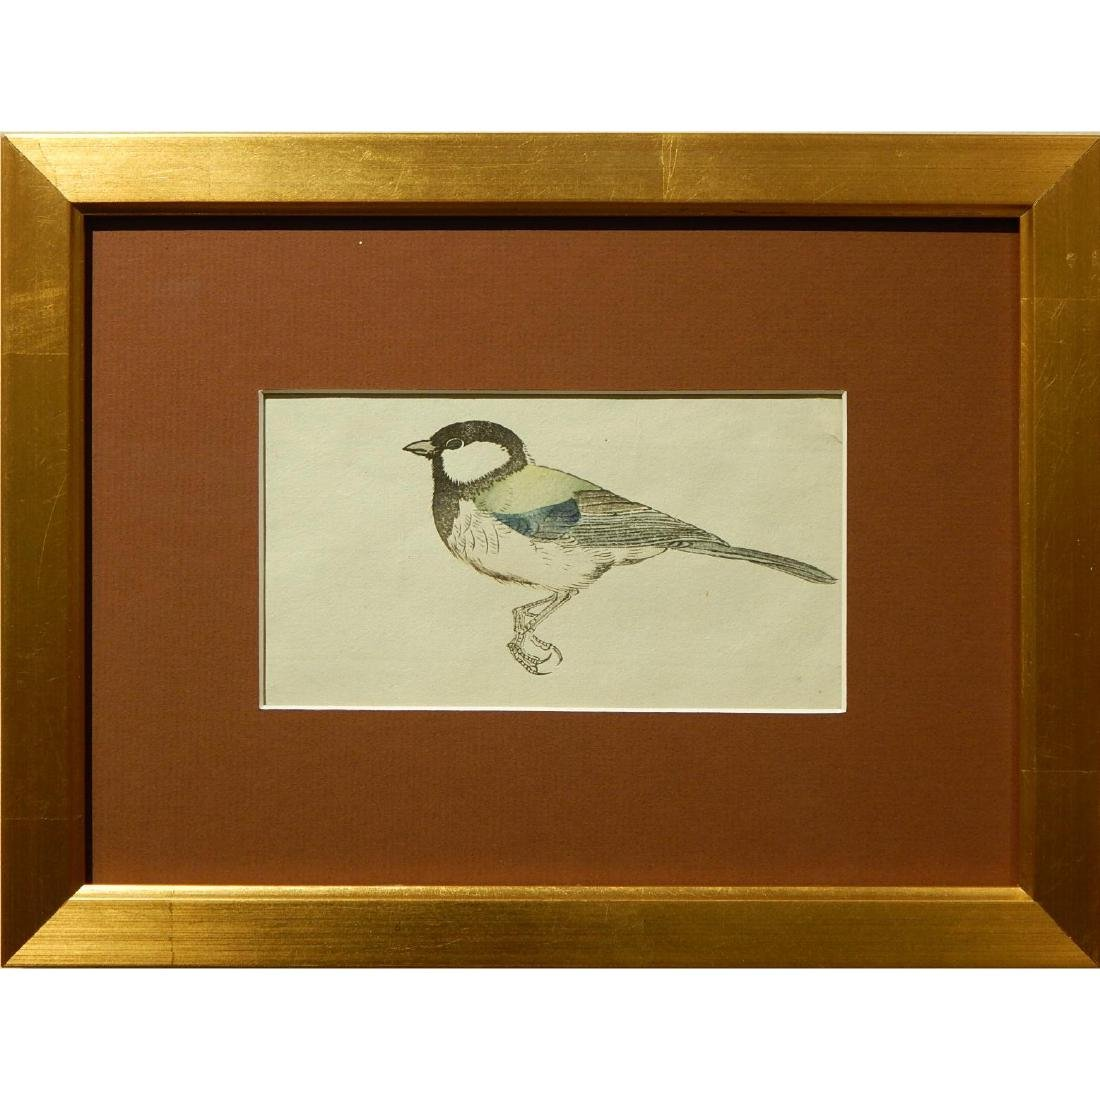 Bird, Japanese woodblock print